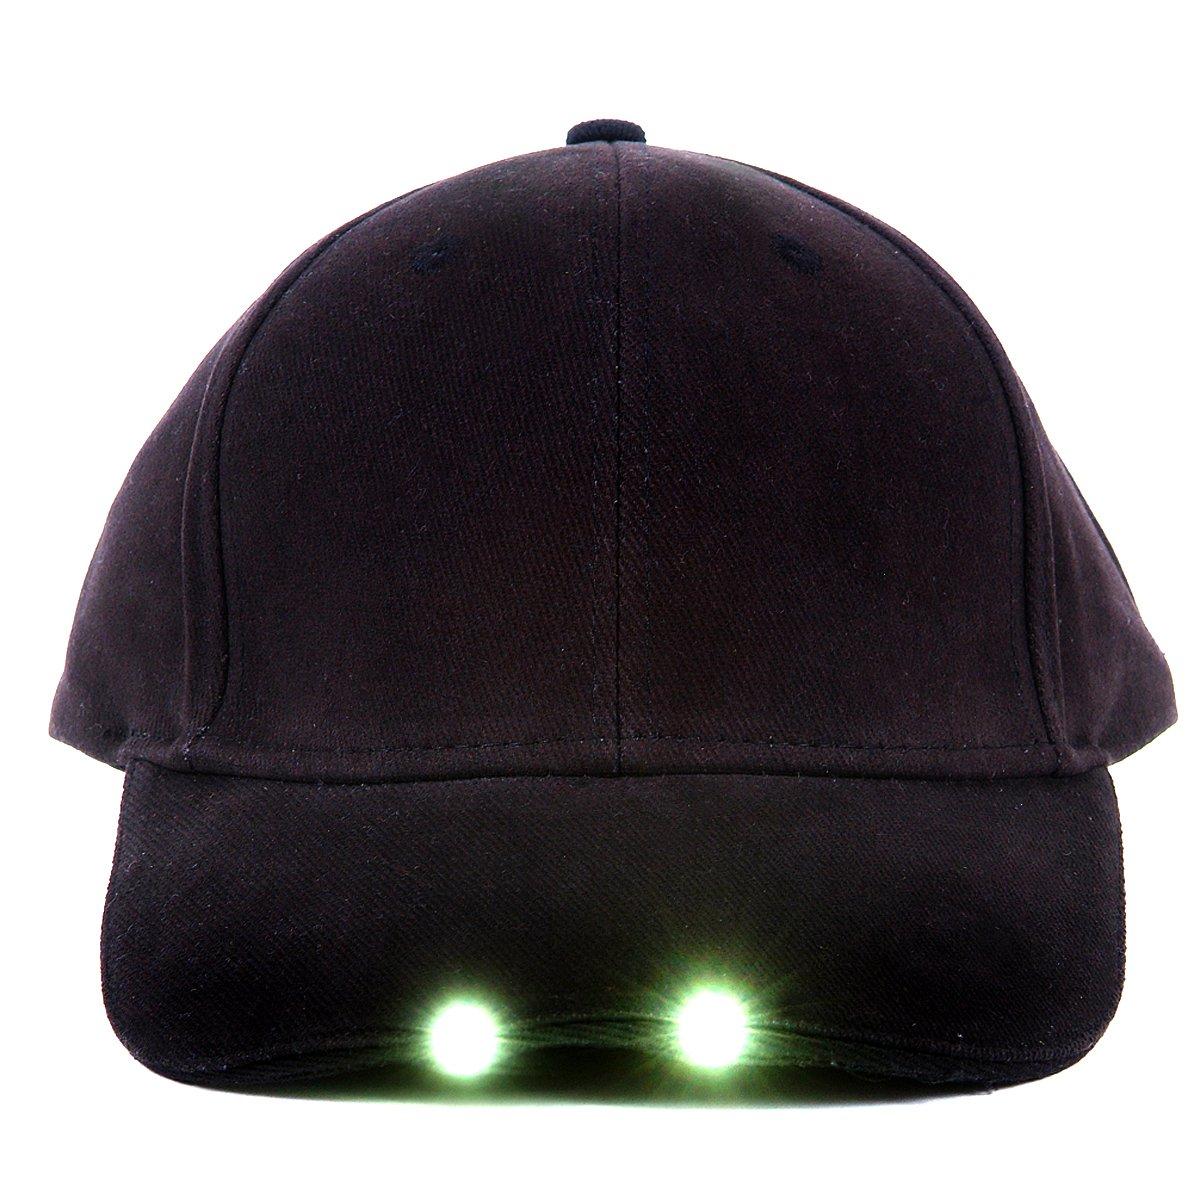 Coleman Black Powercap Hands-Free LED Flashlight Cap